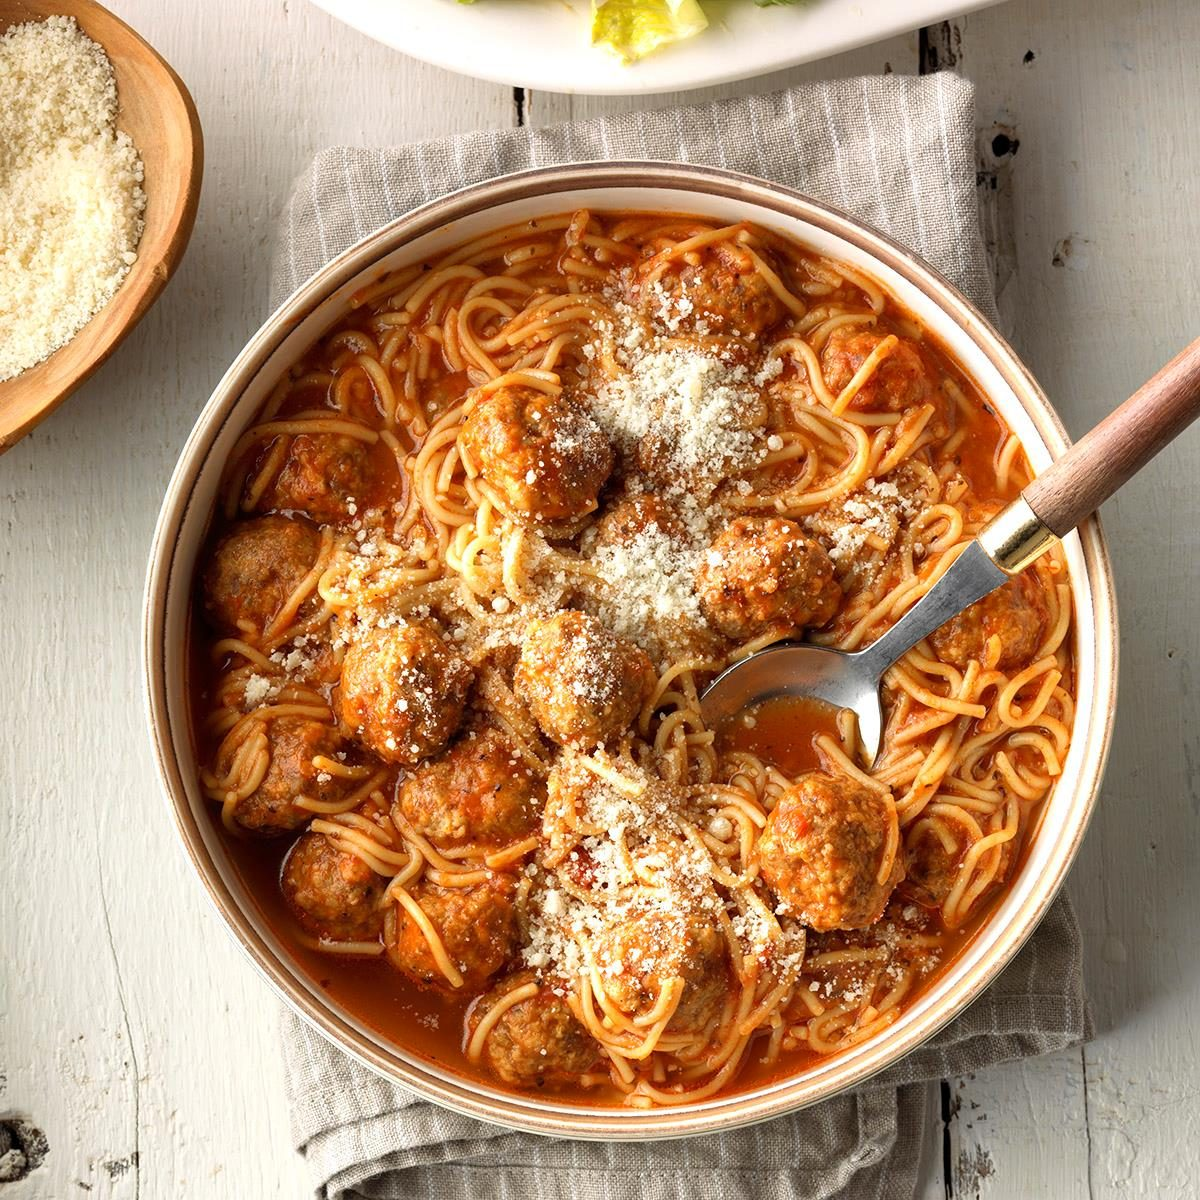 New York: Spaghetti & Meatball Soup